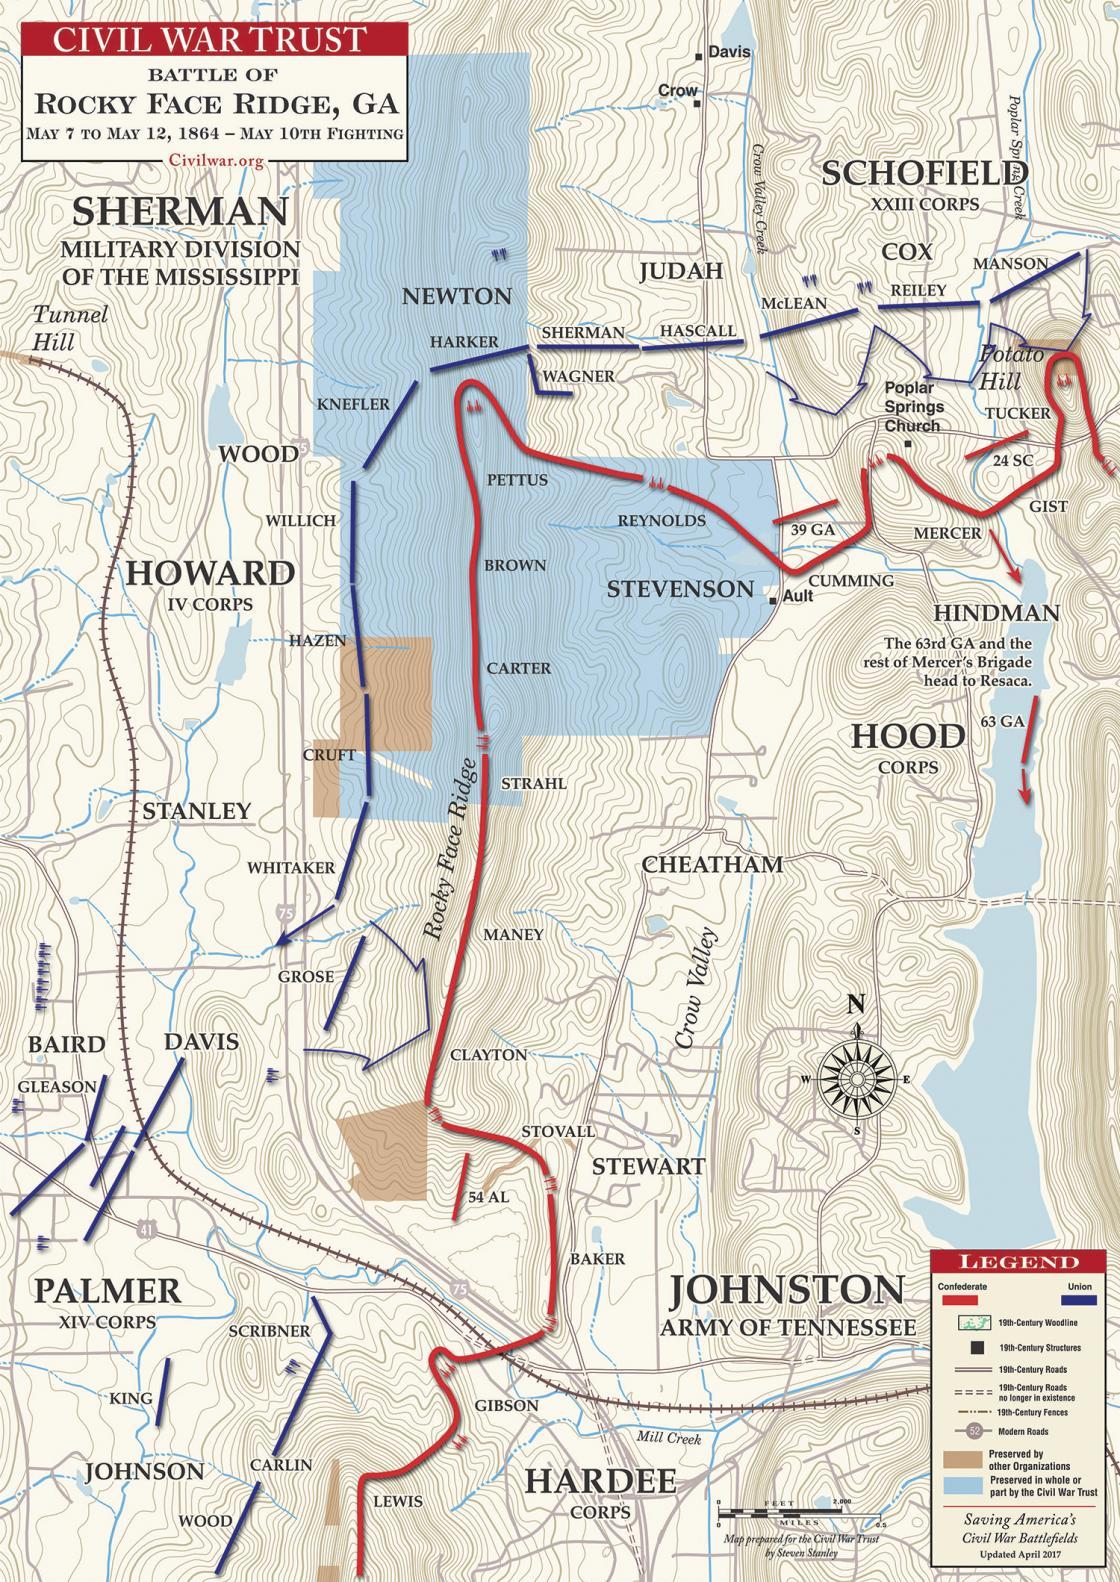 Battle of Rocky Face Ridge - May 10, 1864 | American ... on north carolina earthquake fault line map, ga co map, ga nv map, ga nc map, ga regions map, ga district map, ga tn map, ga elevation map, ga state map, ga fl map, ga interstate map, ga road map, georgia and florida road map, athens ga map, ga al map, ga st map, south carolina map, south ga cities map, ga rivers map, ga ala map,